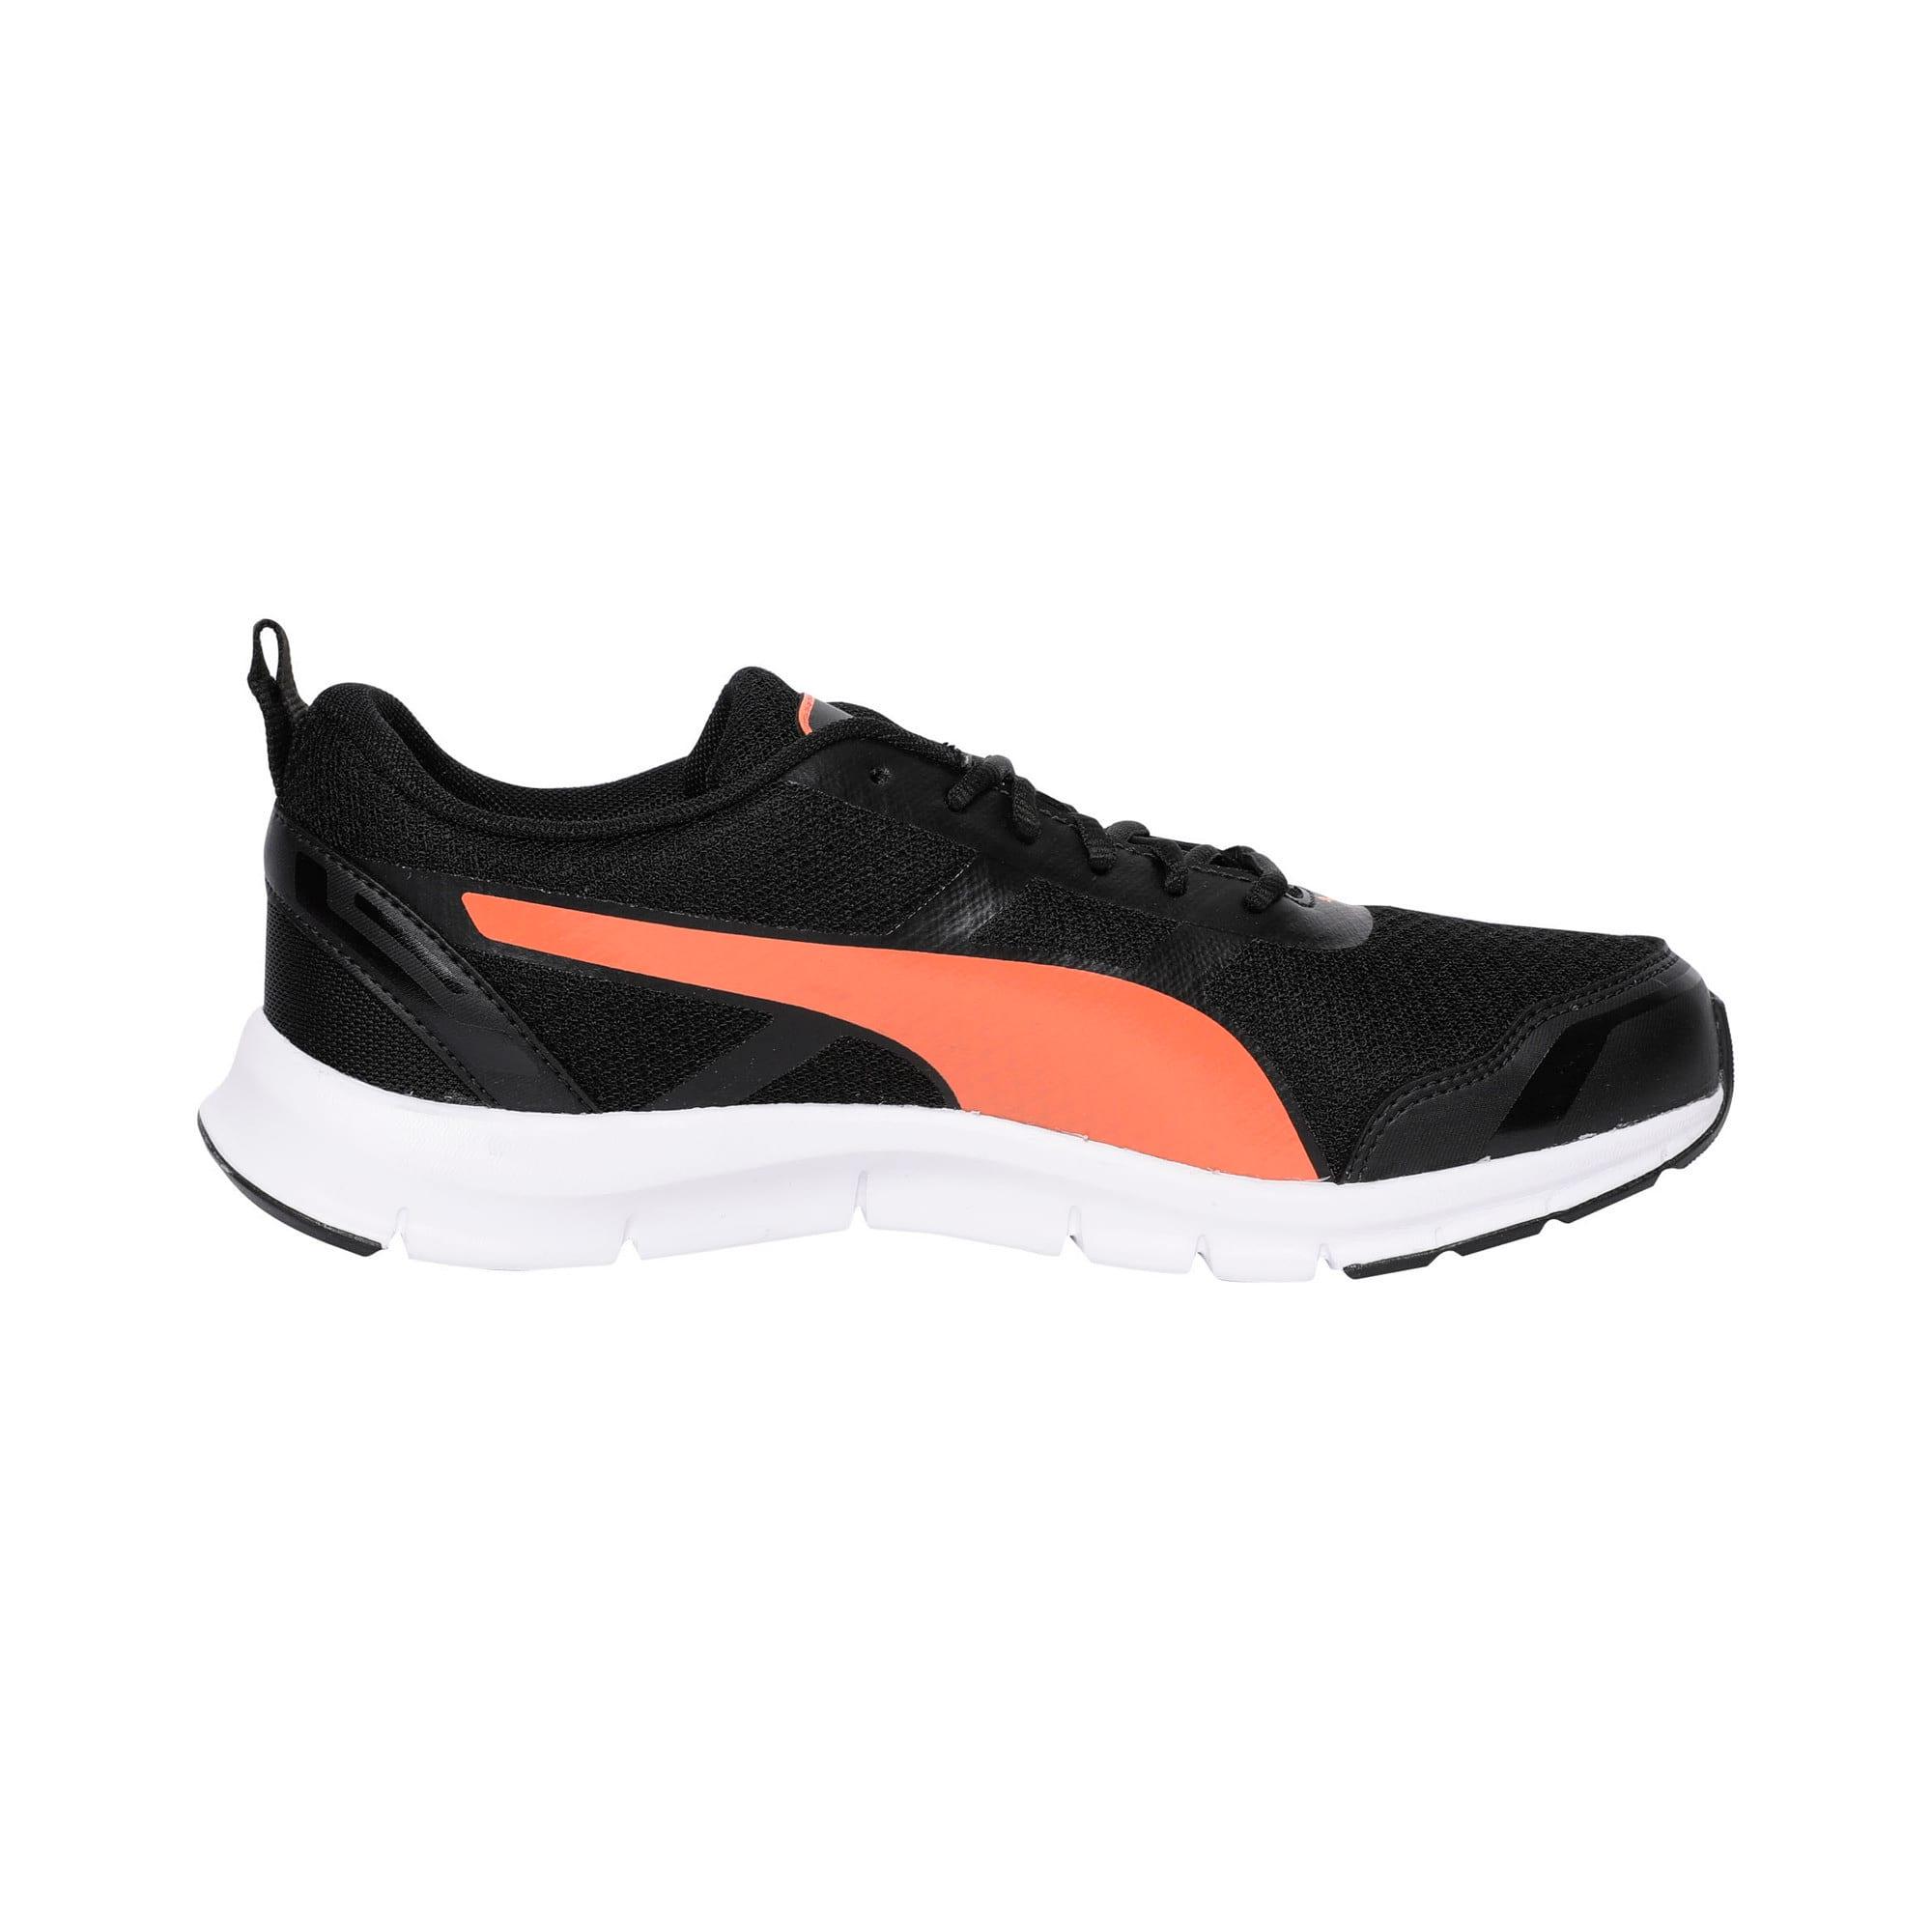 Thumbnail 5 of Track V2 IDP Puma Black-Limepunch-Puma W, Puma Black-Vibrant Orange, medium-IND